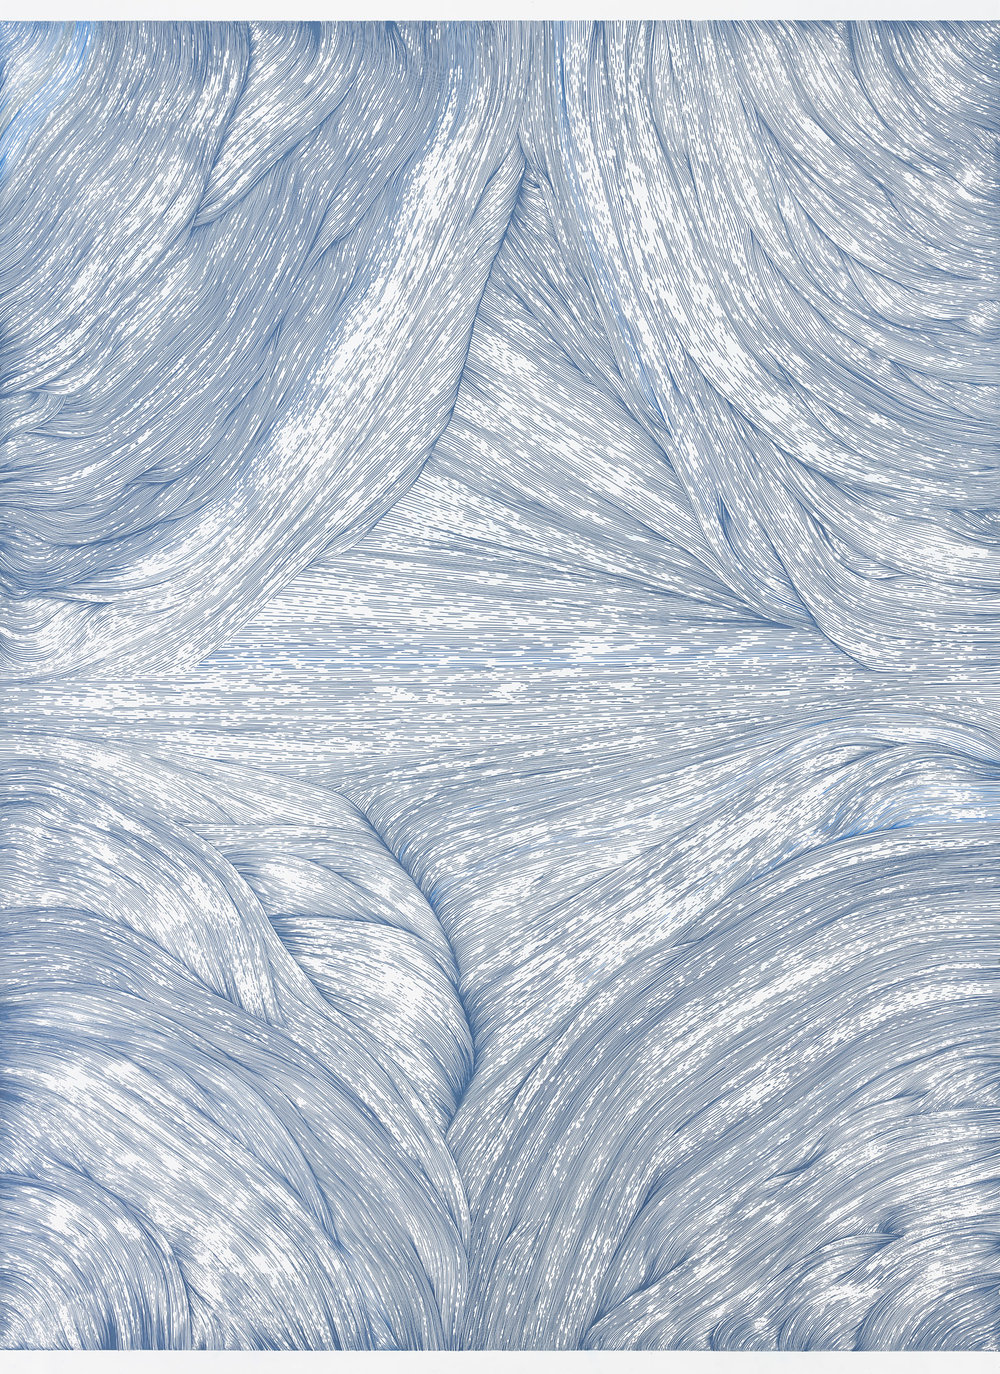 BK P3320   untitled   blue metallic gloss paint marker on paper   200x150cm   2016